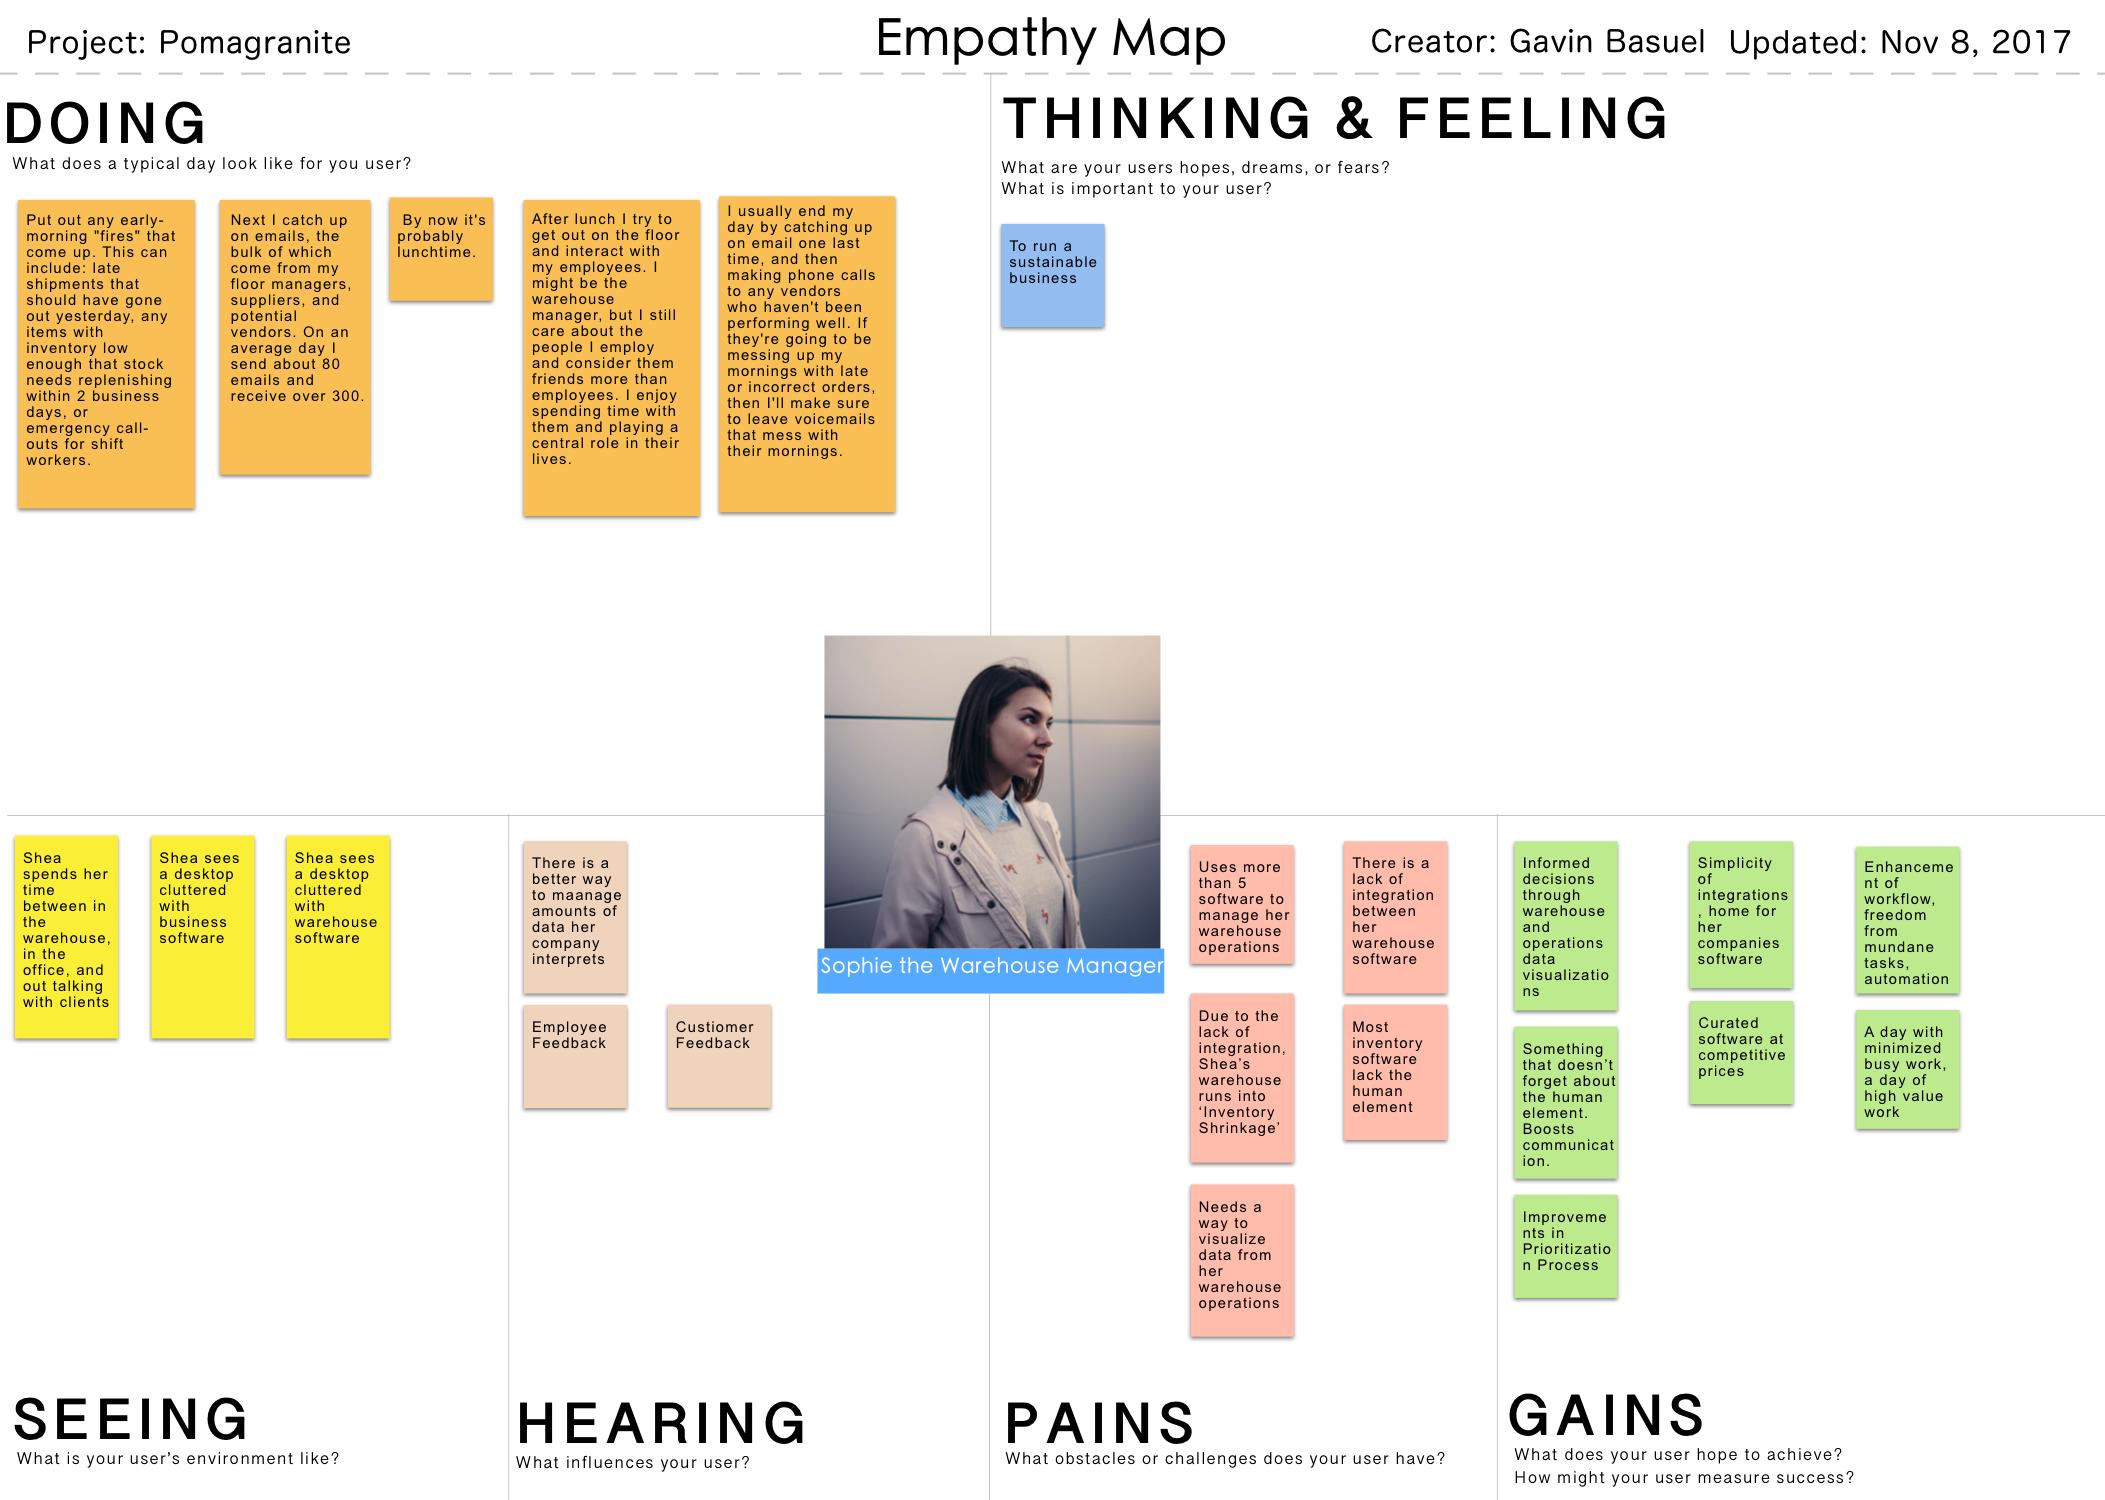 Empathy Map Pom.png